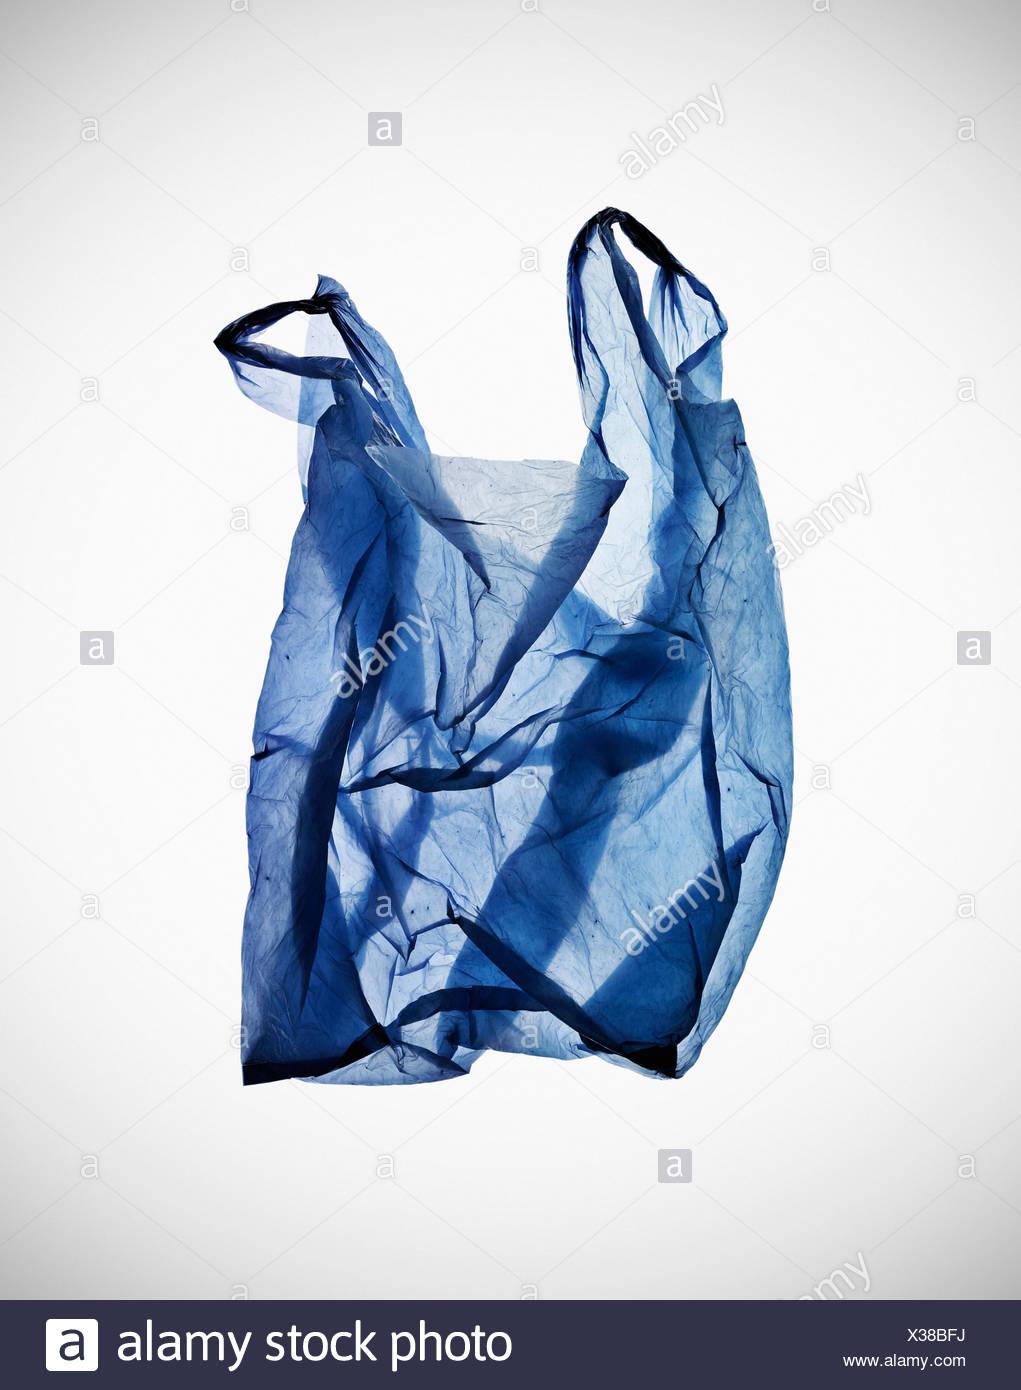 Crumpled blue plastic bag on table Stock Photo